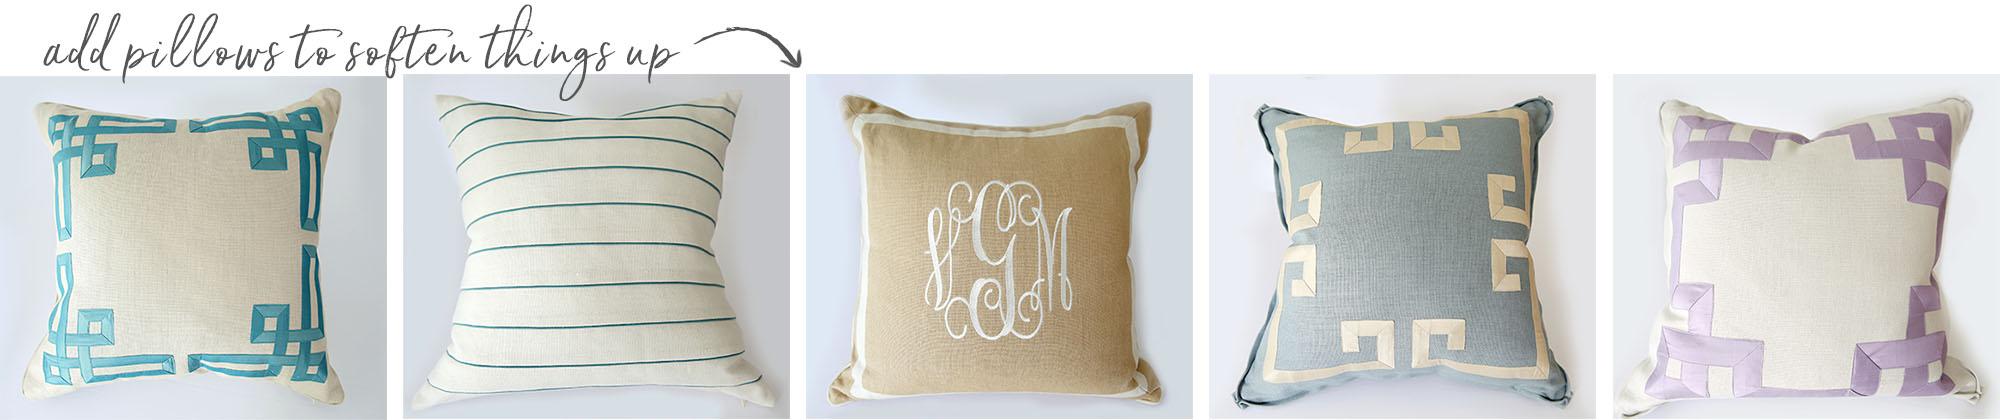 Custom linen pillows - Studio Linen Collection from A. HOME